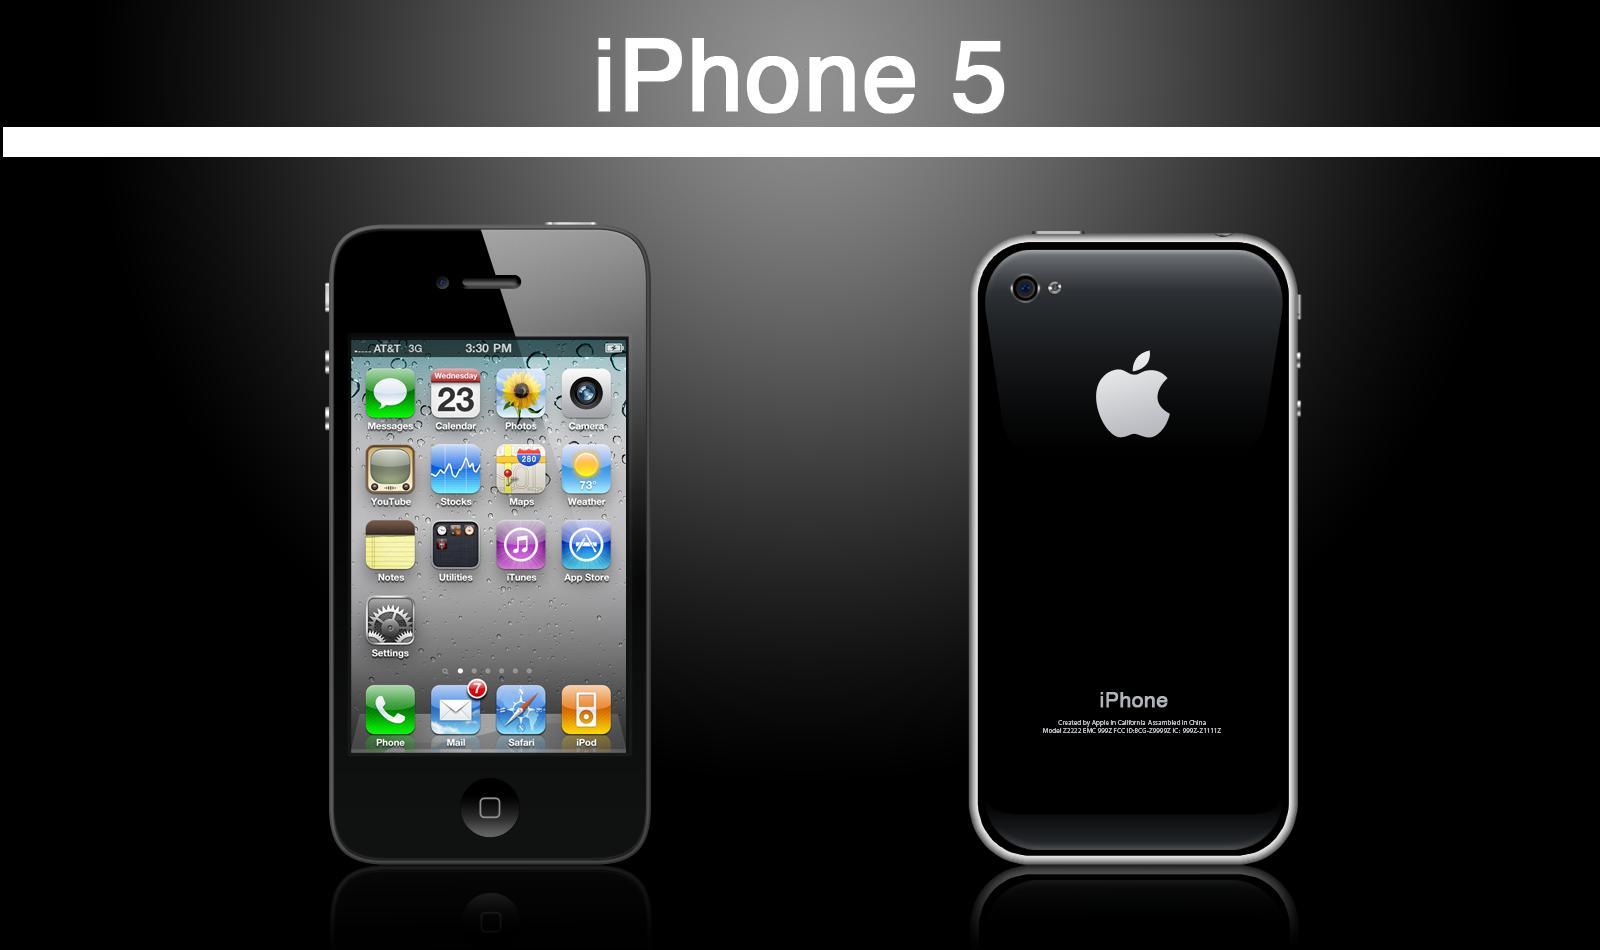 iphone generasi keenam apple iphone 5 pandhawa tiga. Black Bedroom Furniture Sets. Home Design Ideas